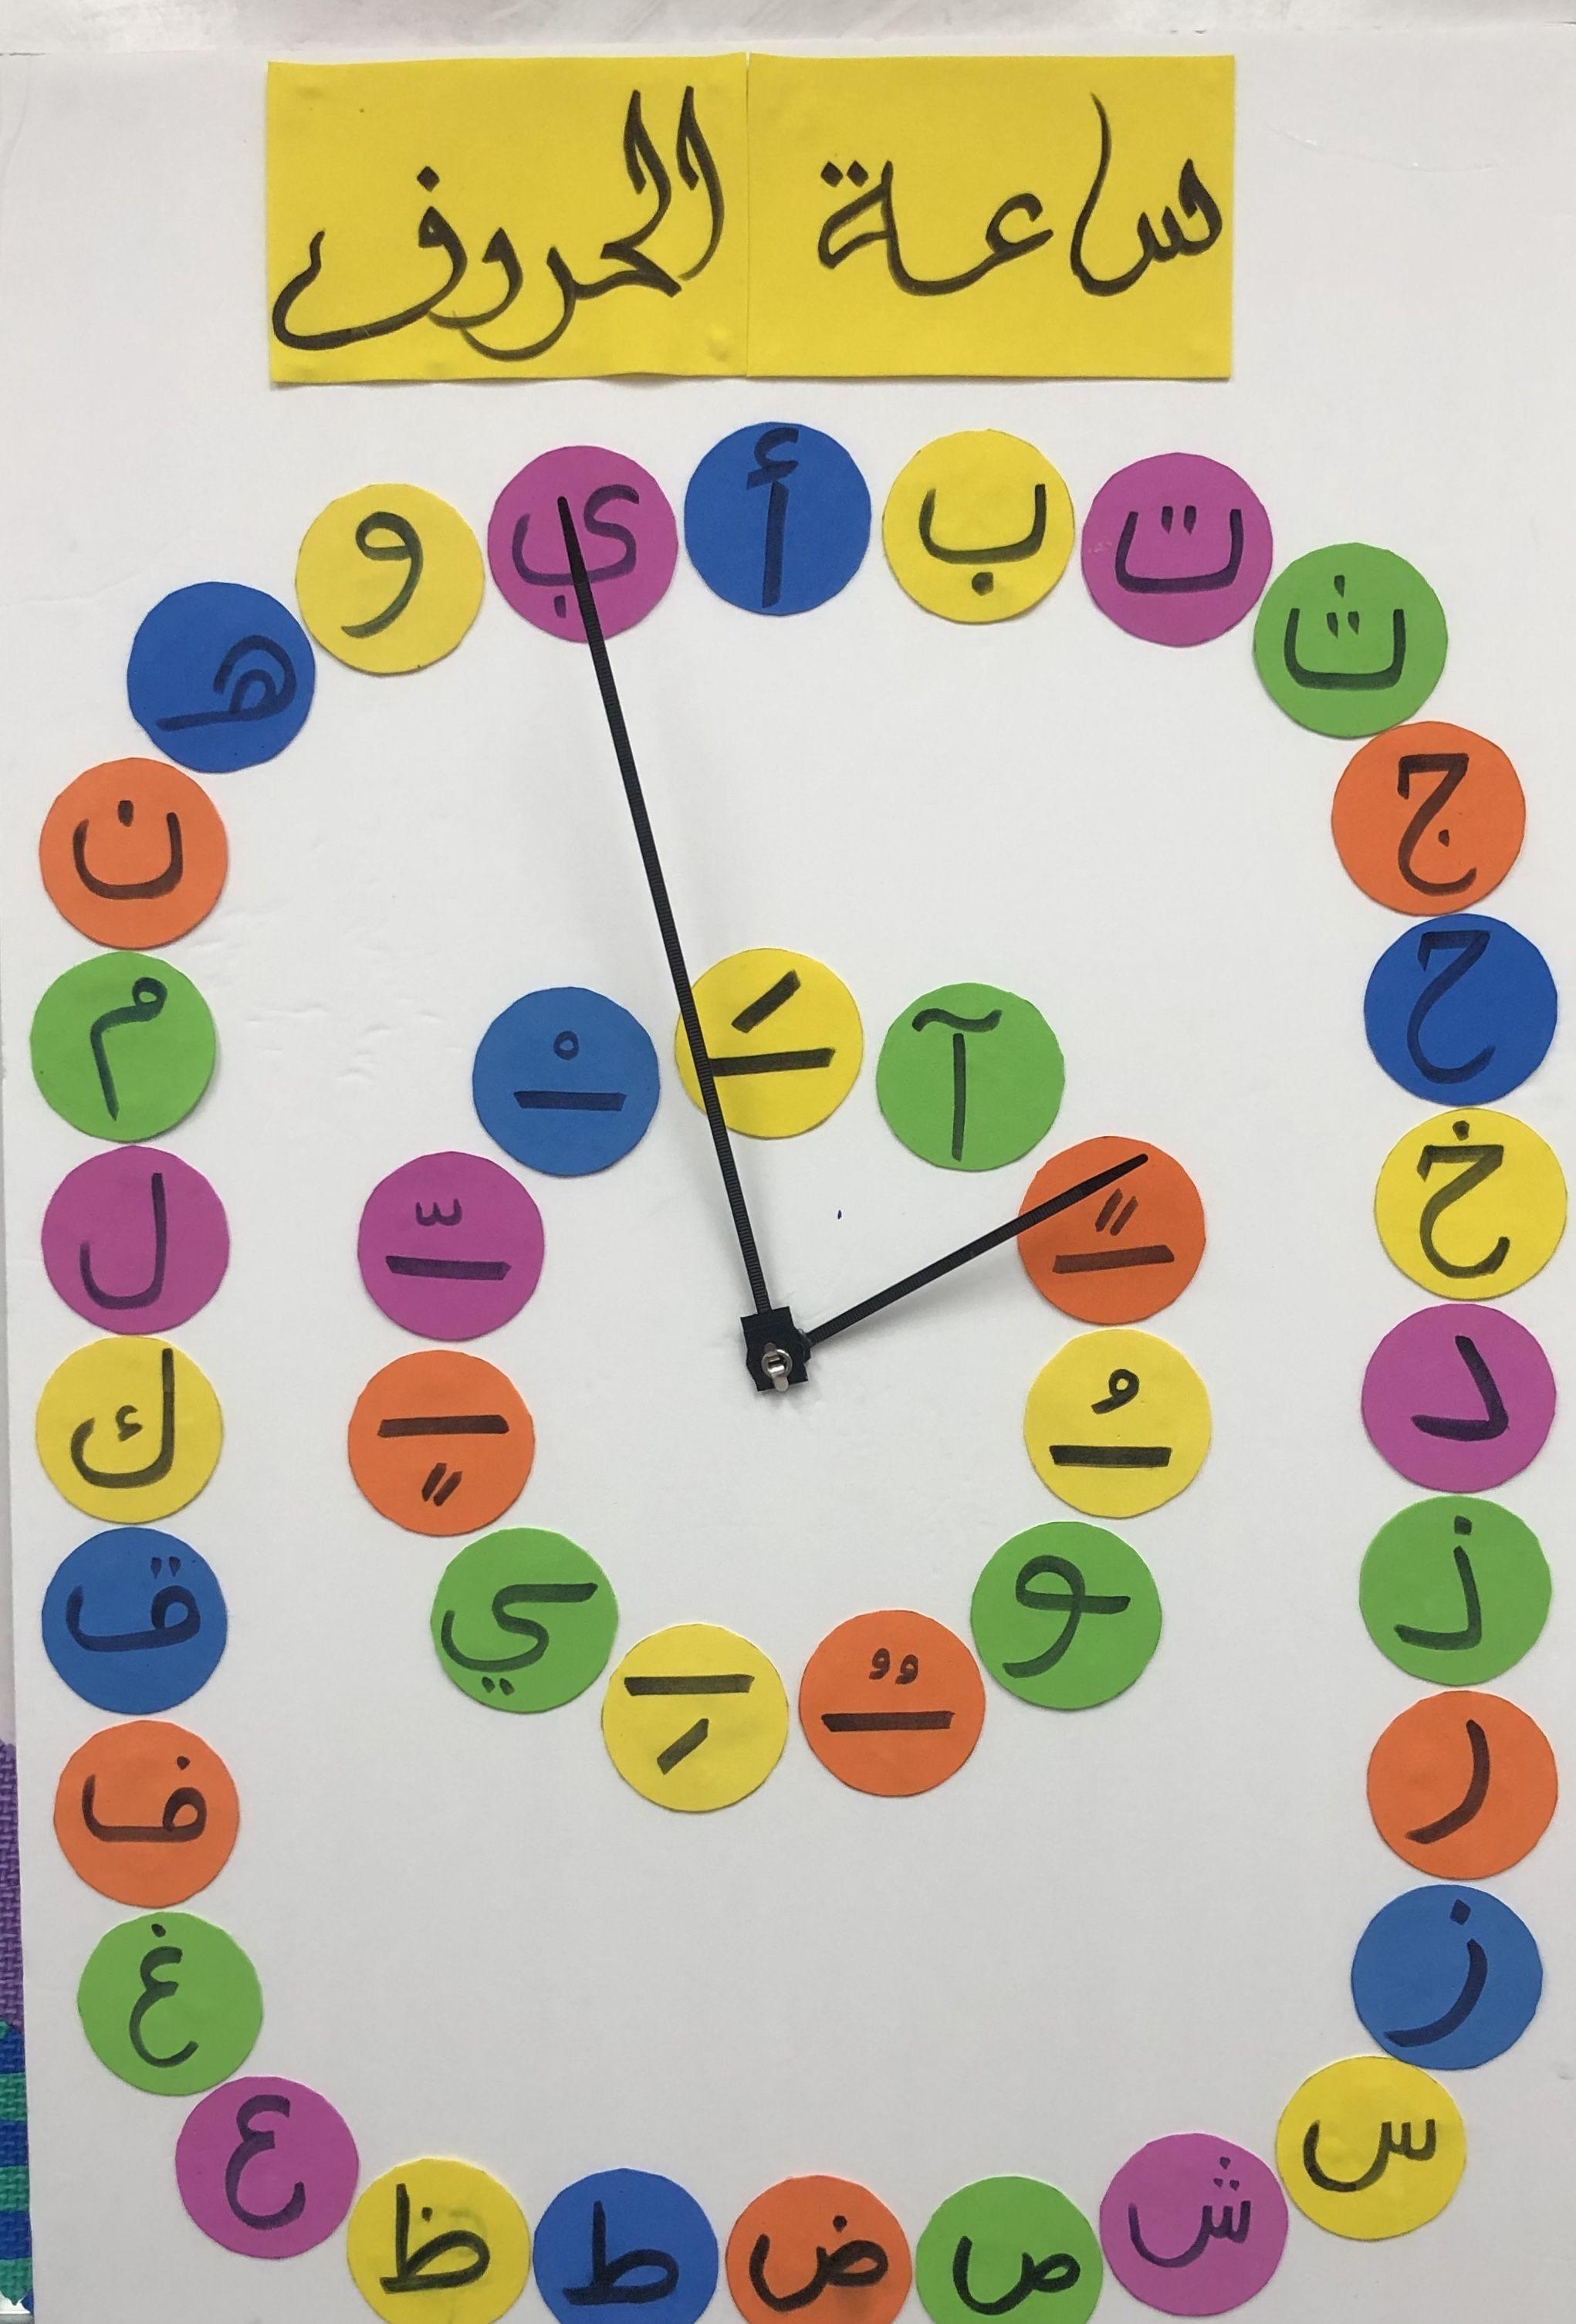 Arabic Alphabet Clock ساعة الحروف العربية Arabic Alphabet For Kids Learning Arabic Learn Arabic Alphabet